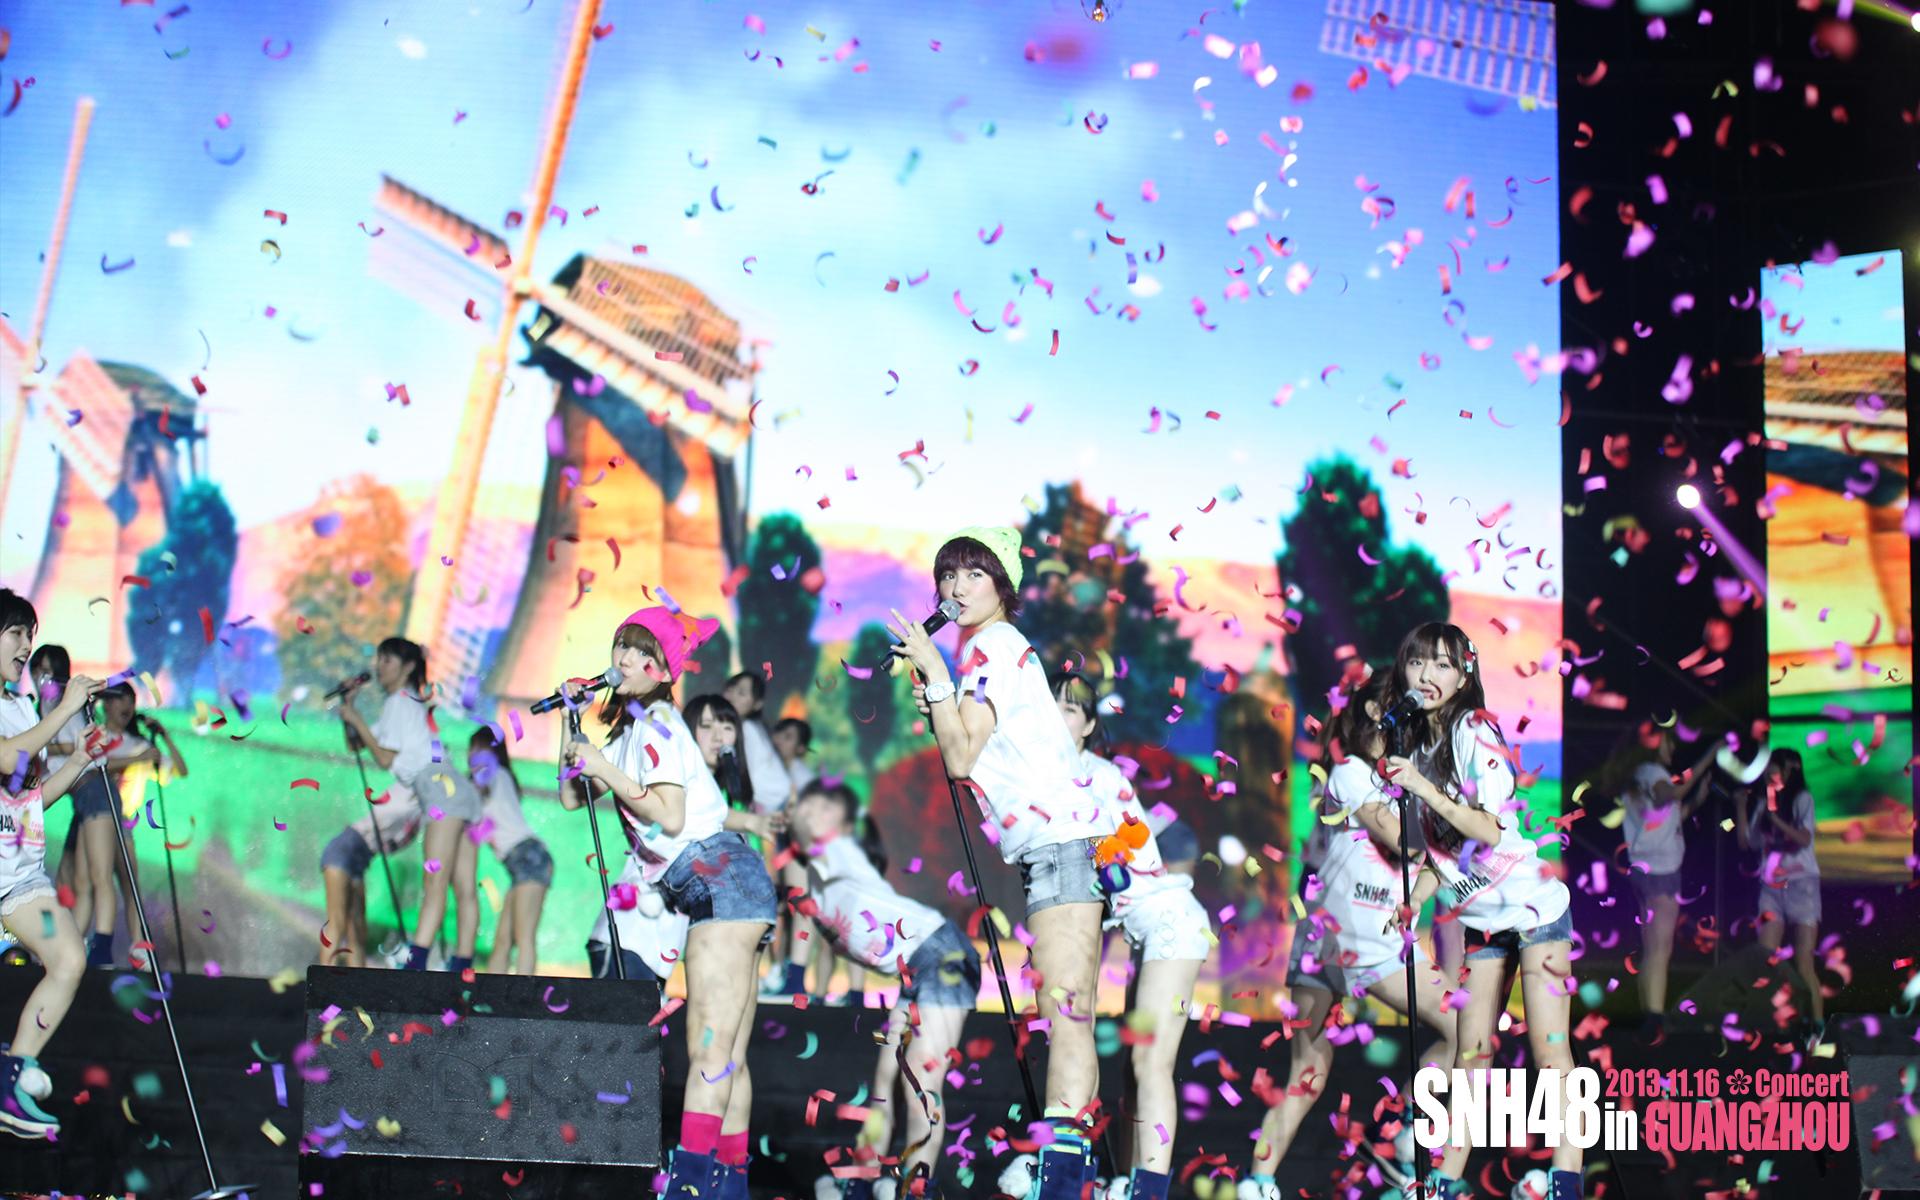 snh48广州万人演唱会主题壁纸大放送